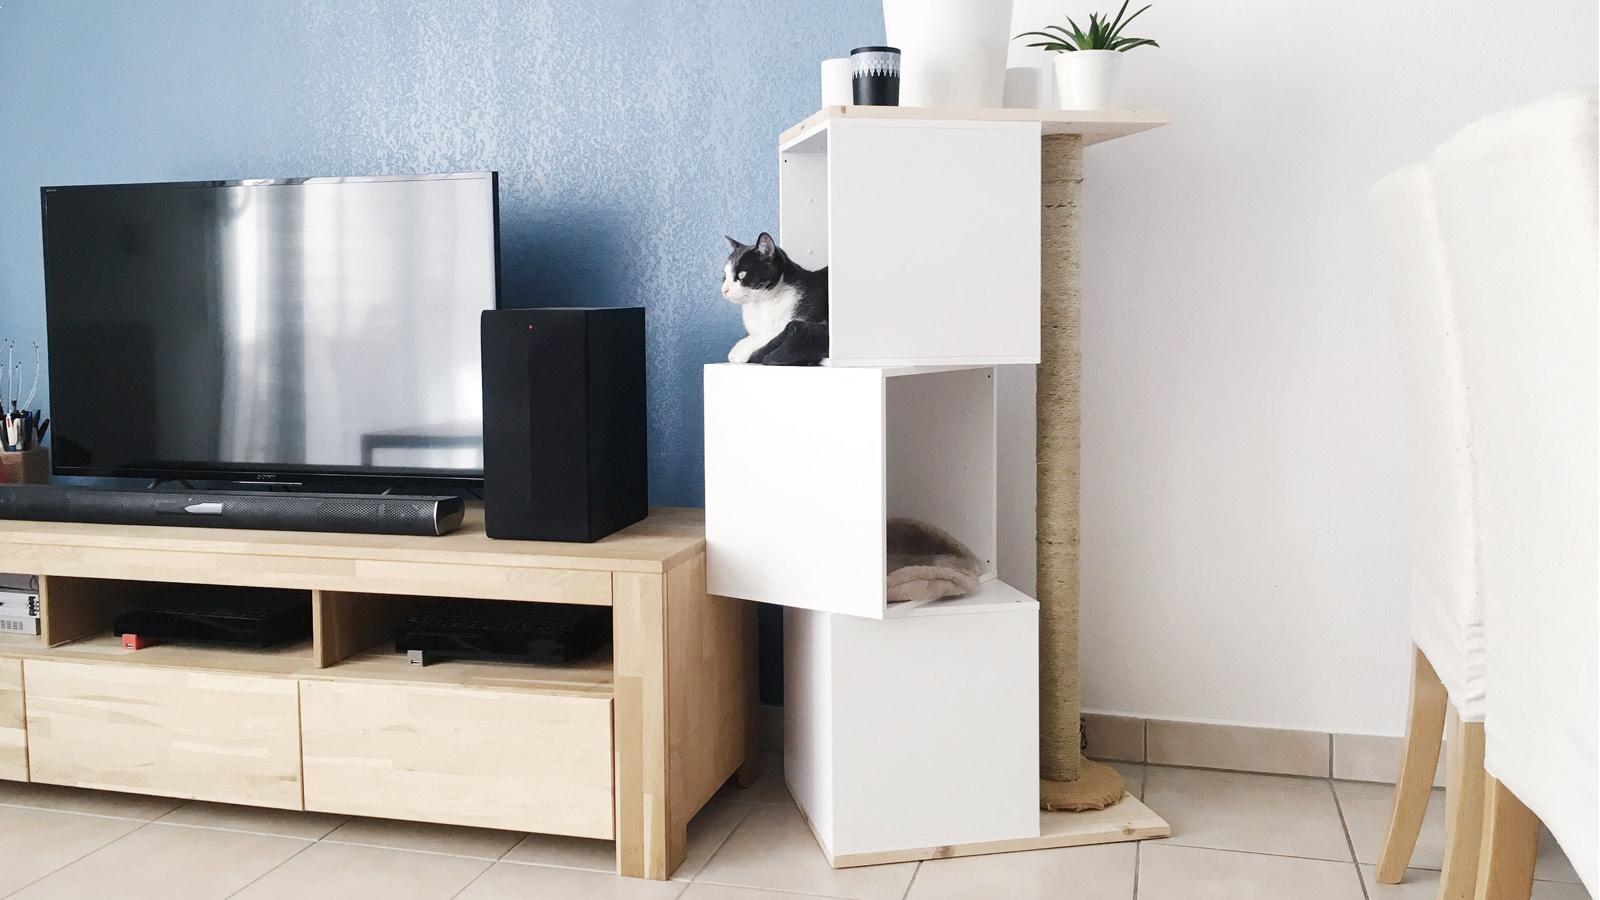 diy fabriquer un arbre chat facilement diy d co. Black Bedroom Furniture Sets. Home Design Ideas